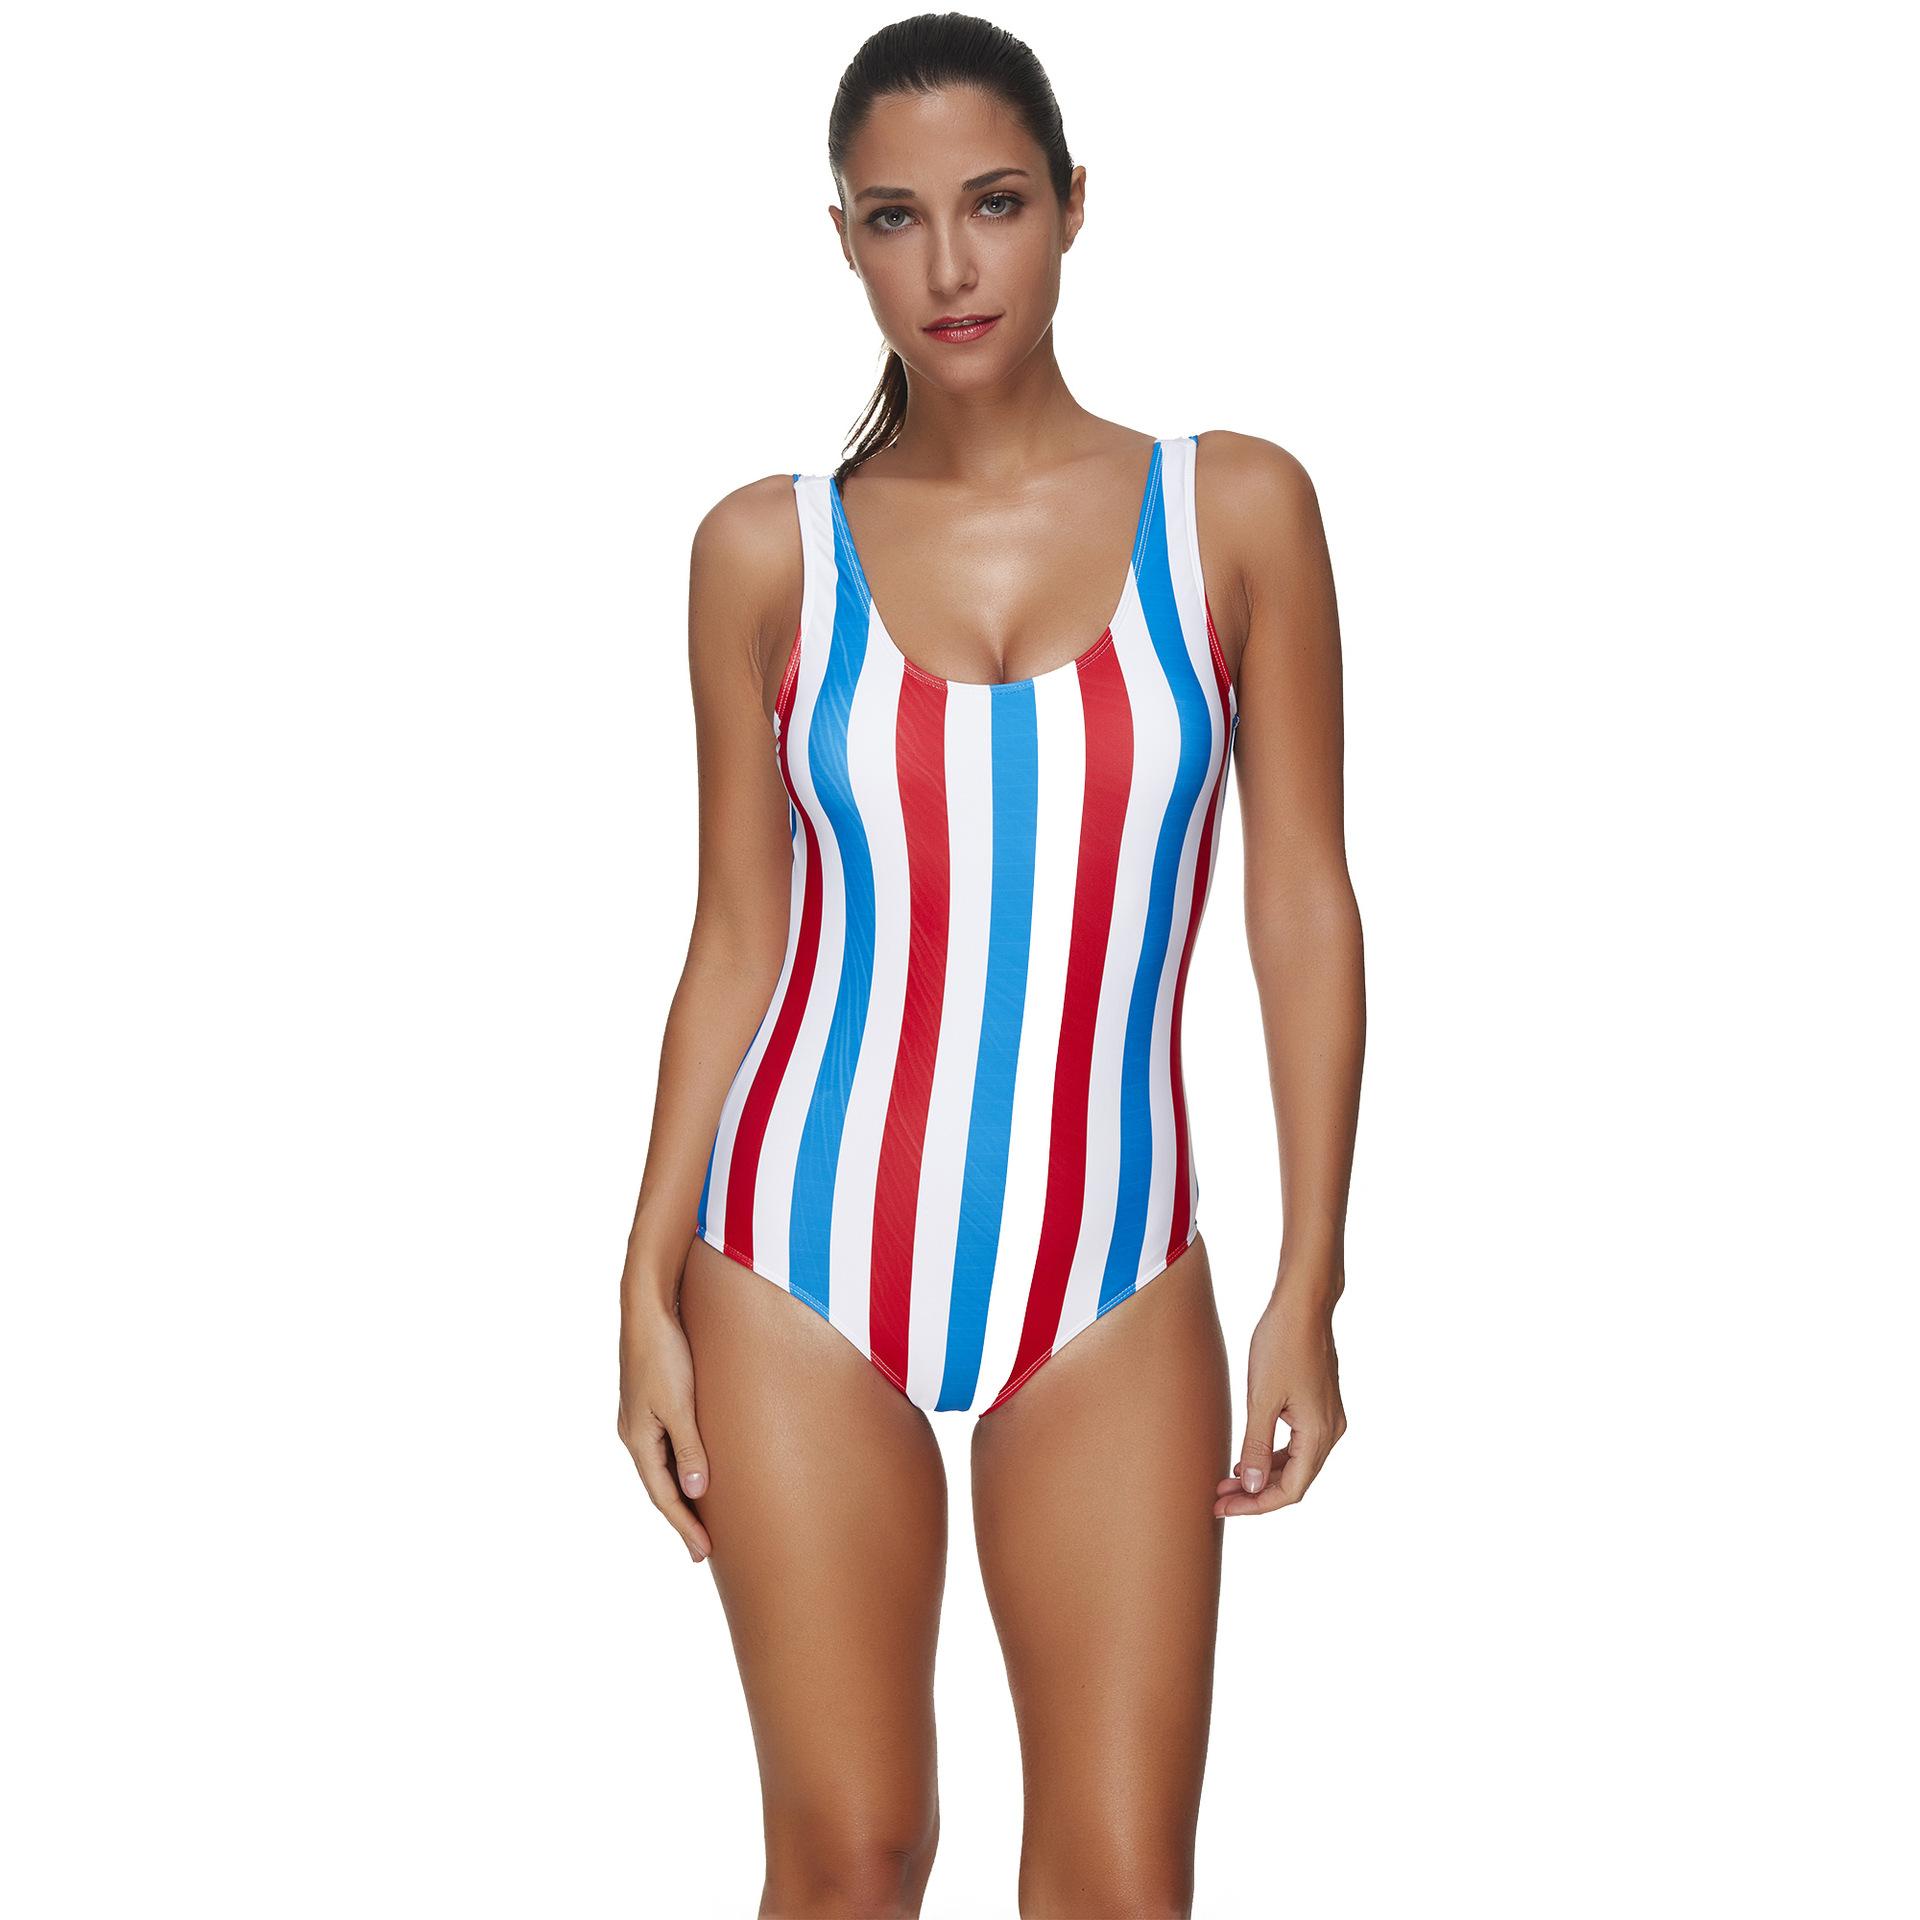 Cotton Sexy & PartySwimwear(LS1005-XL) NHYS0069-LS1005-XL